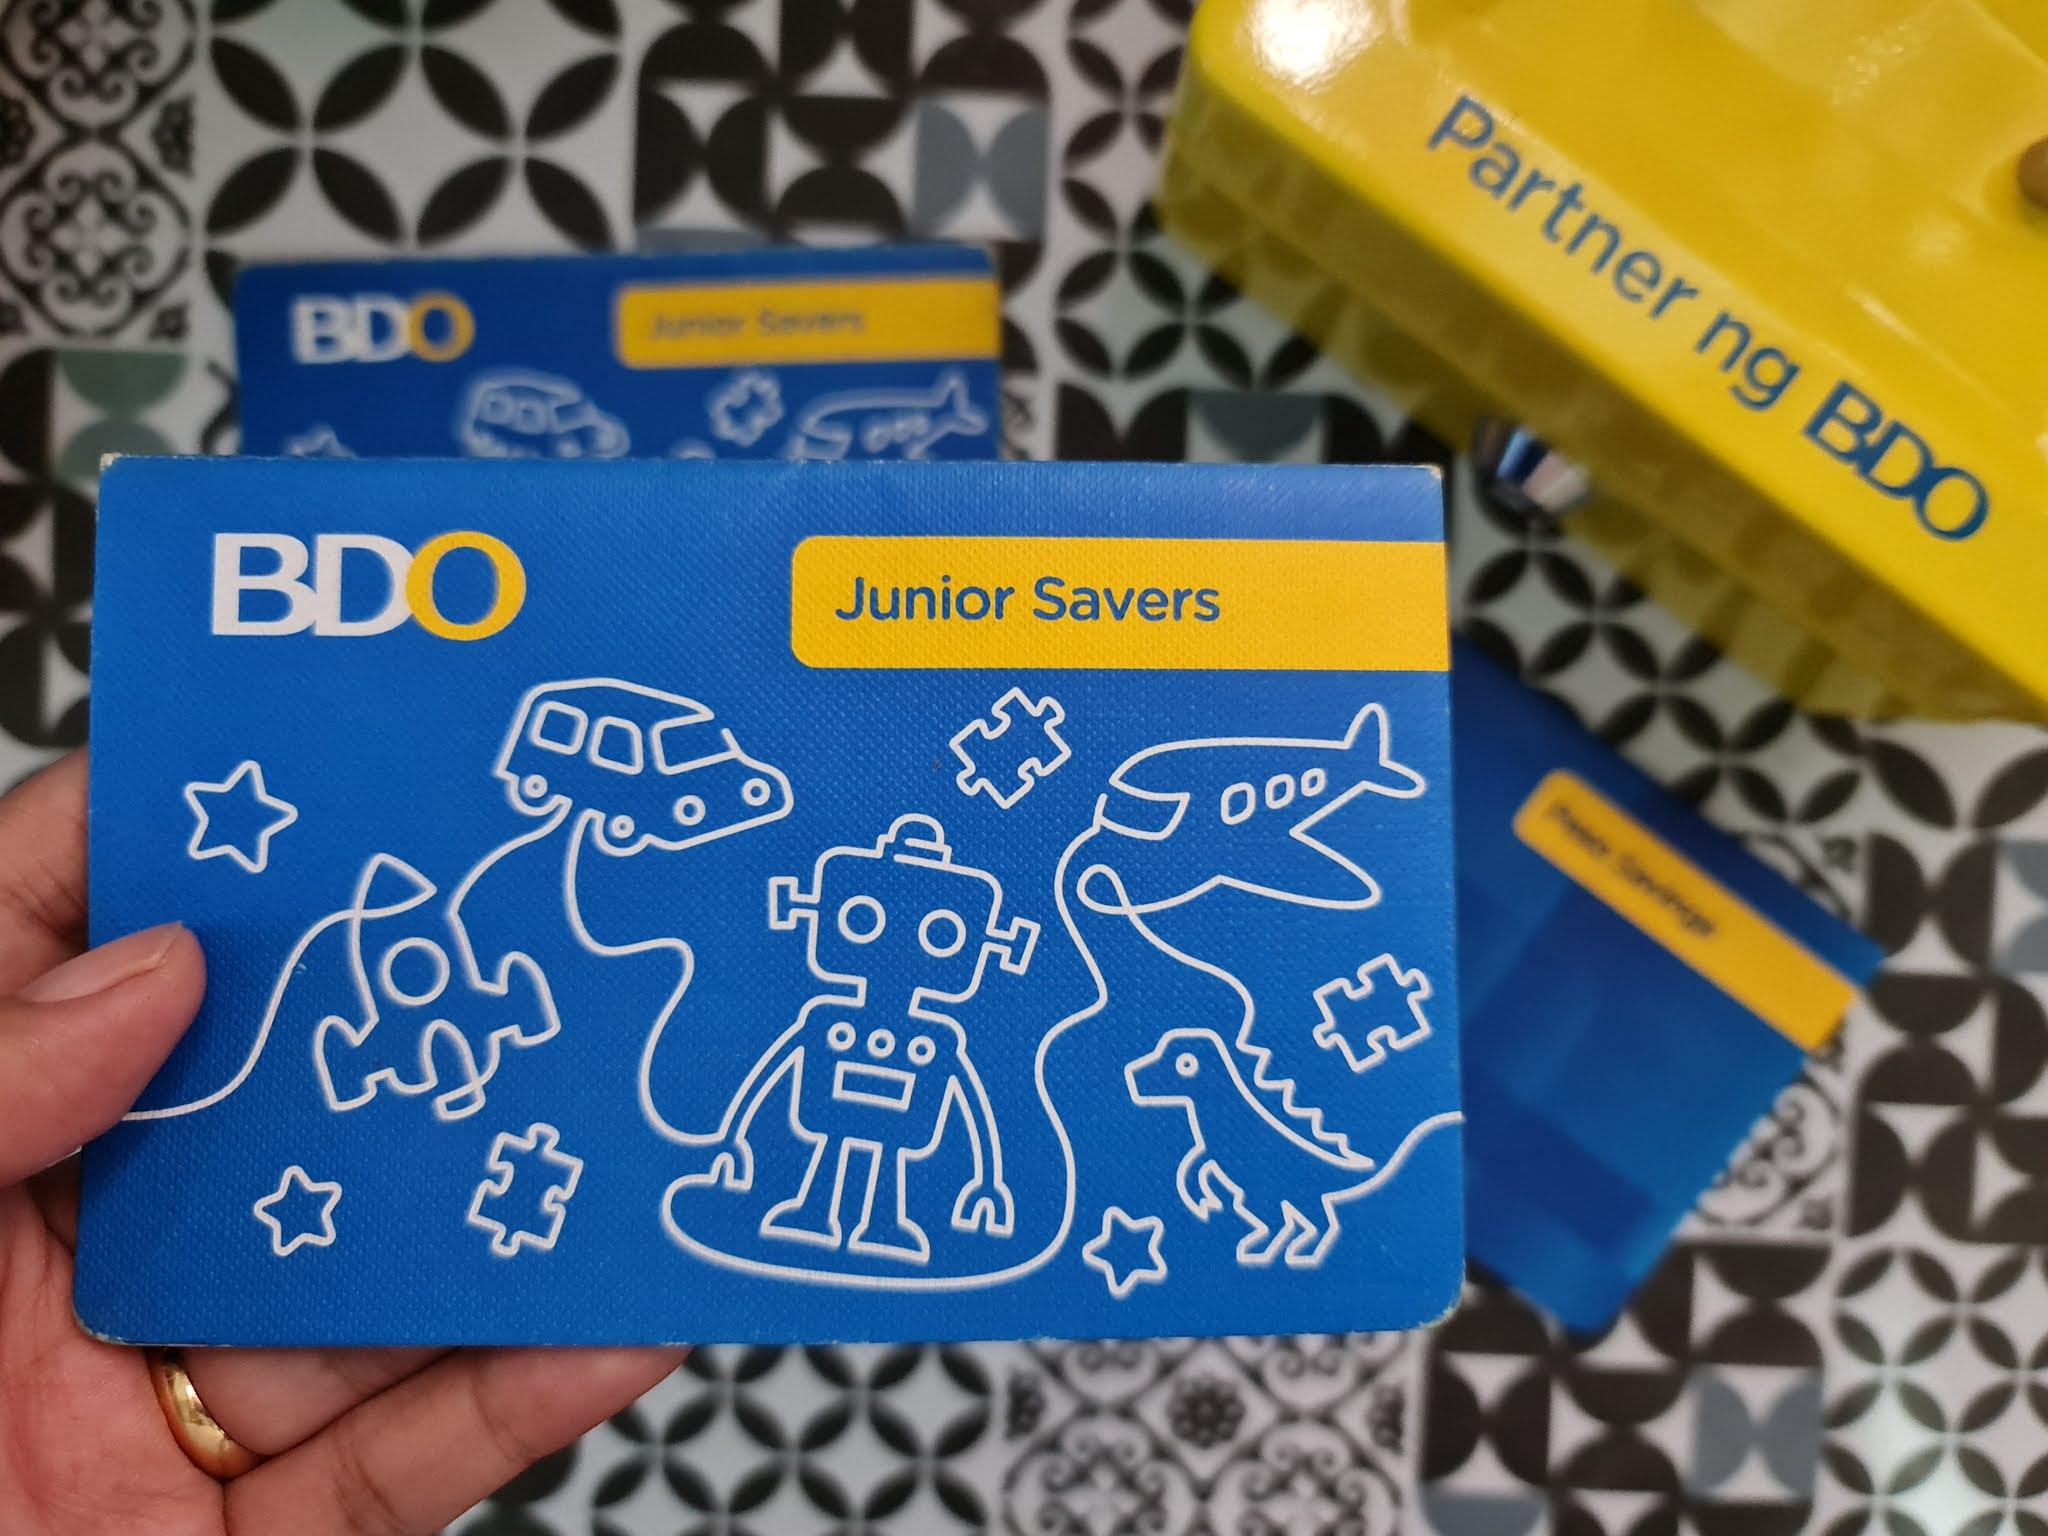 BDO Junior Savers passbook